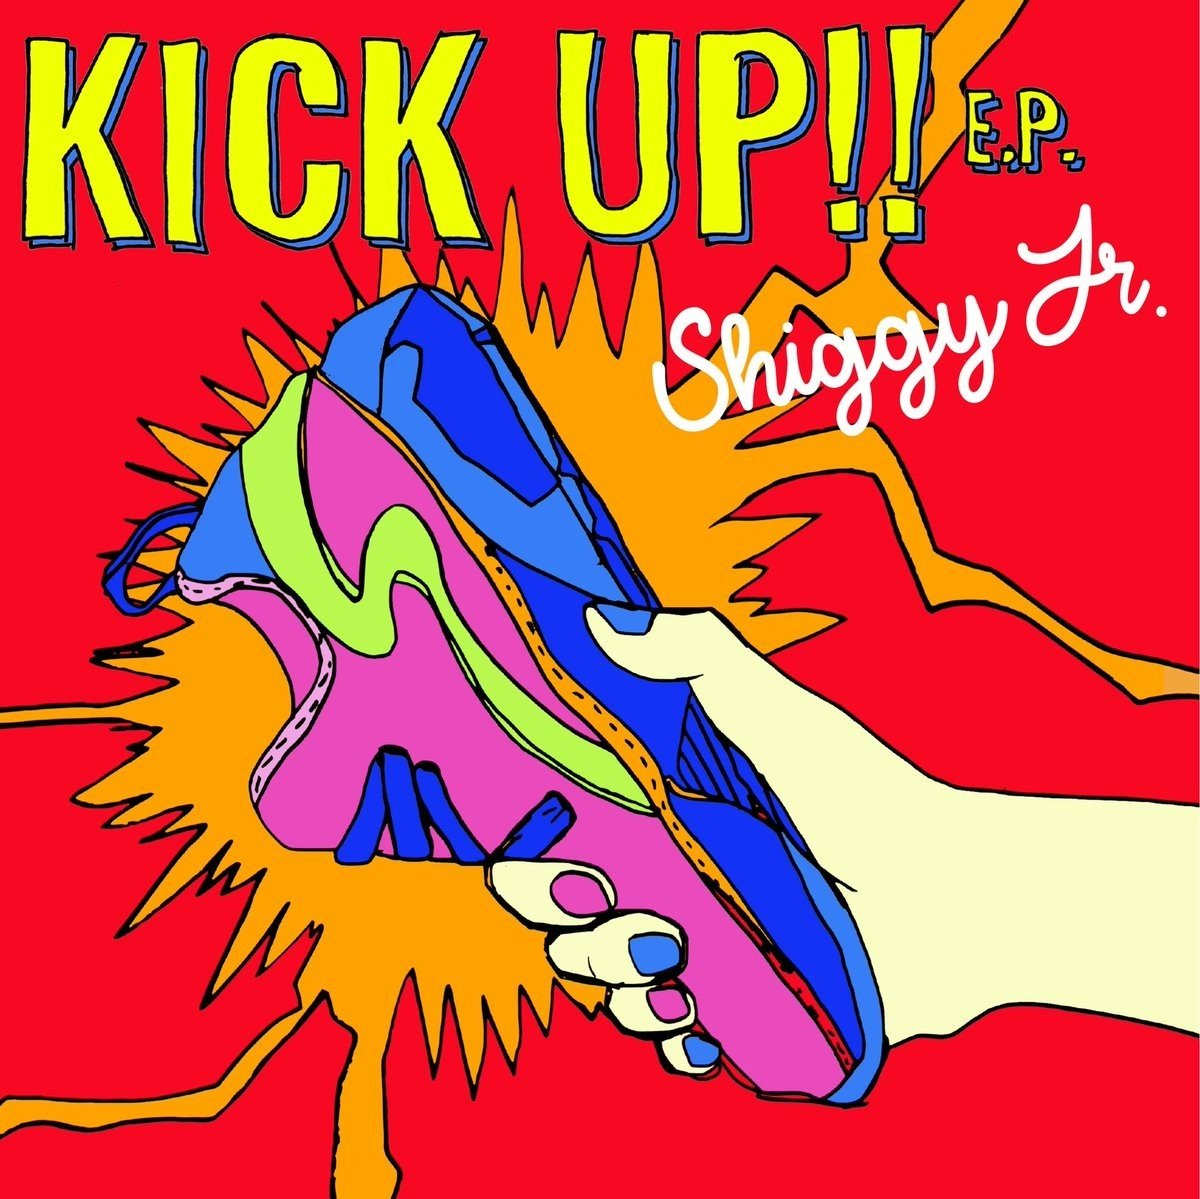 [Single] Shiggy Jr. – KICK UP!! E.P. [FLAC / 24bit Lossless / WEB] [2018.05.23]